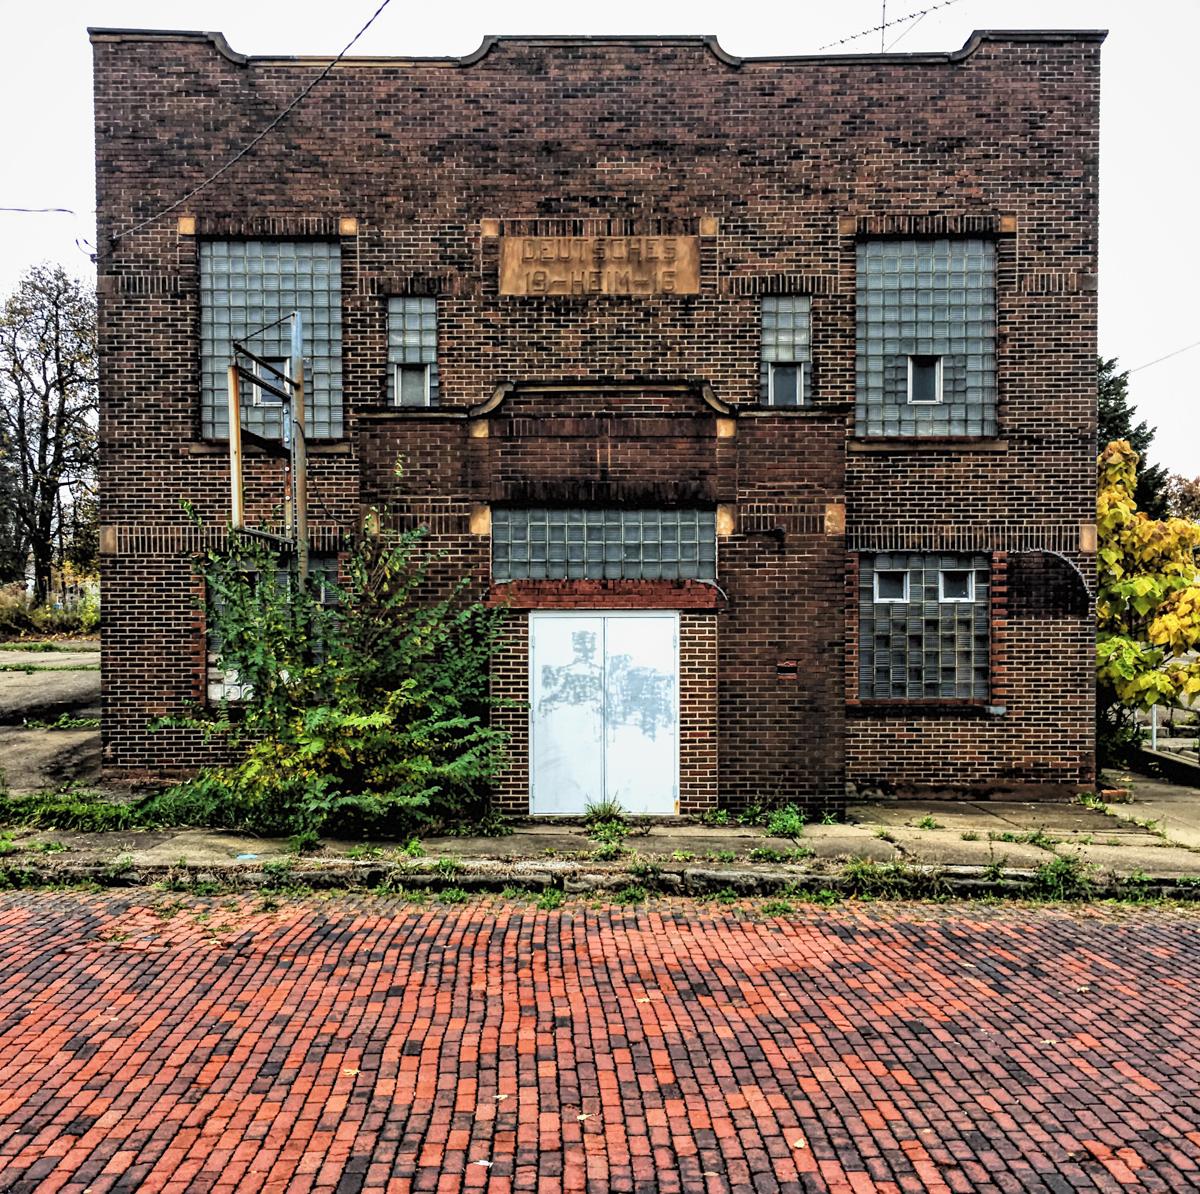 German Home Farrell  © Brian Cohen/TDW 2017